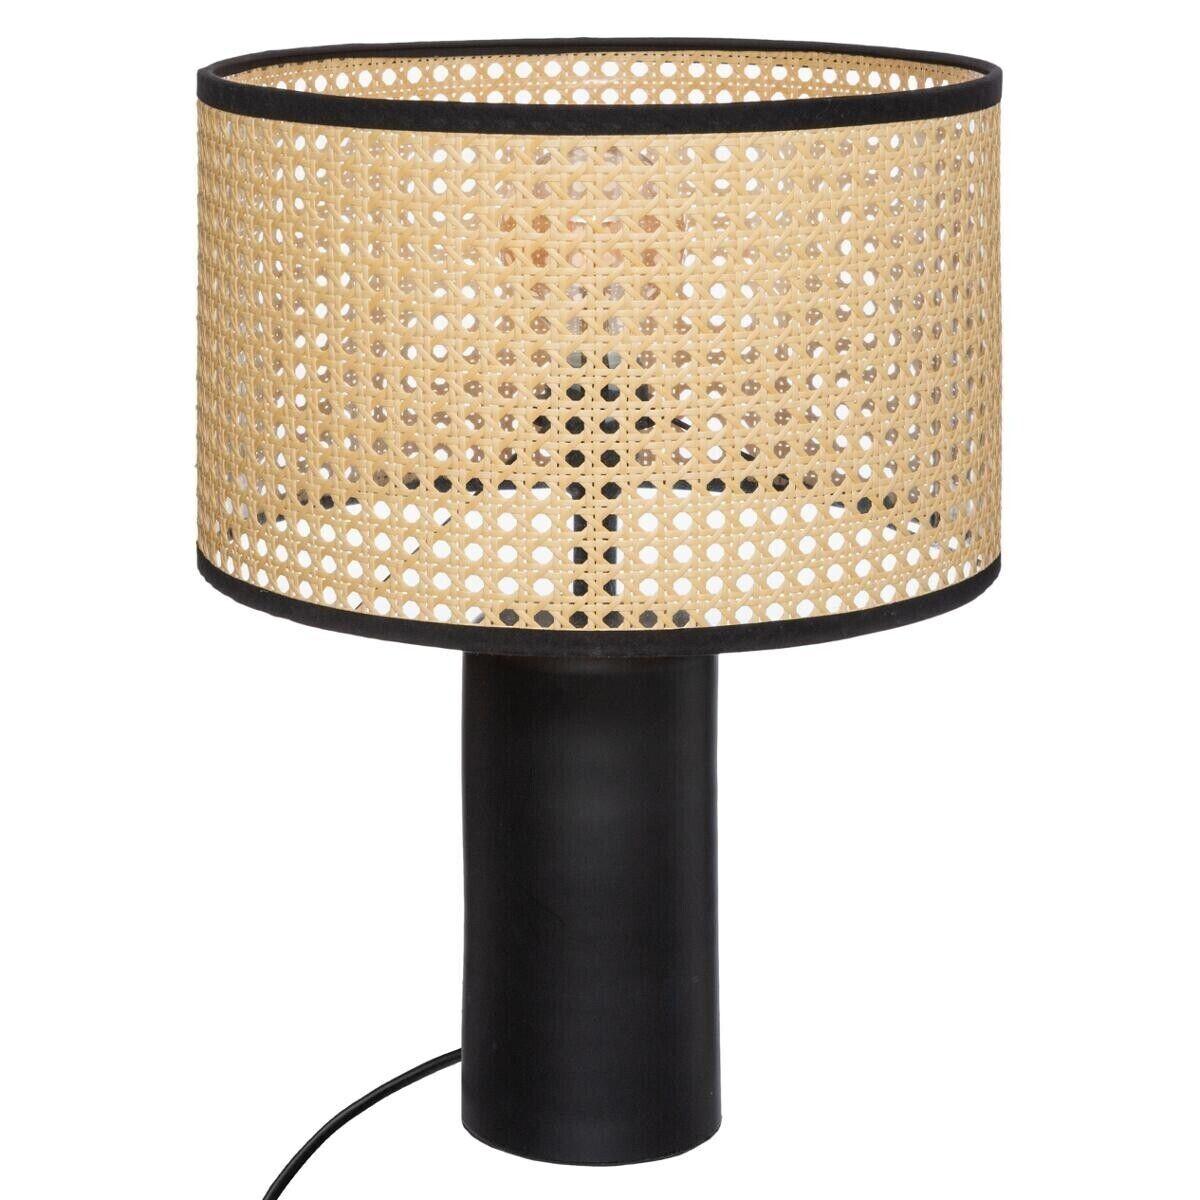 Atmosphera Lampe 'Arty' noire, cannage H47 cm